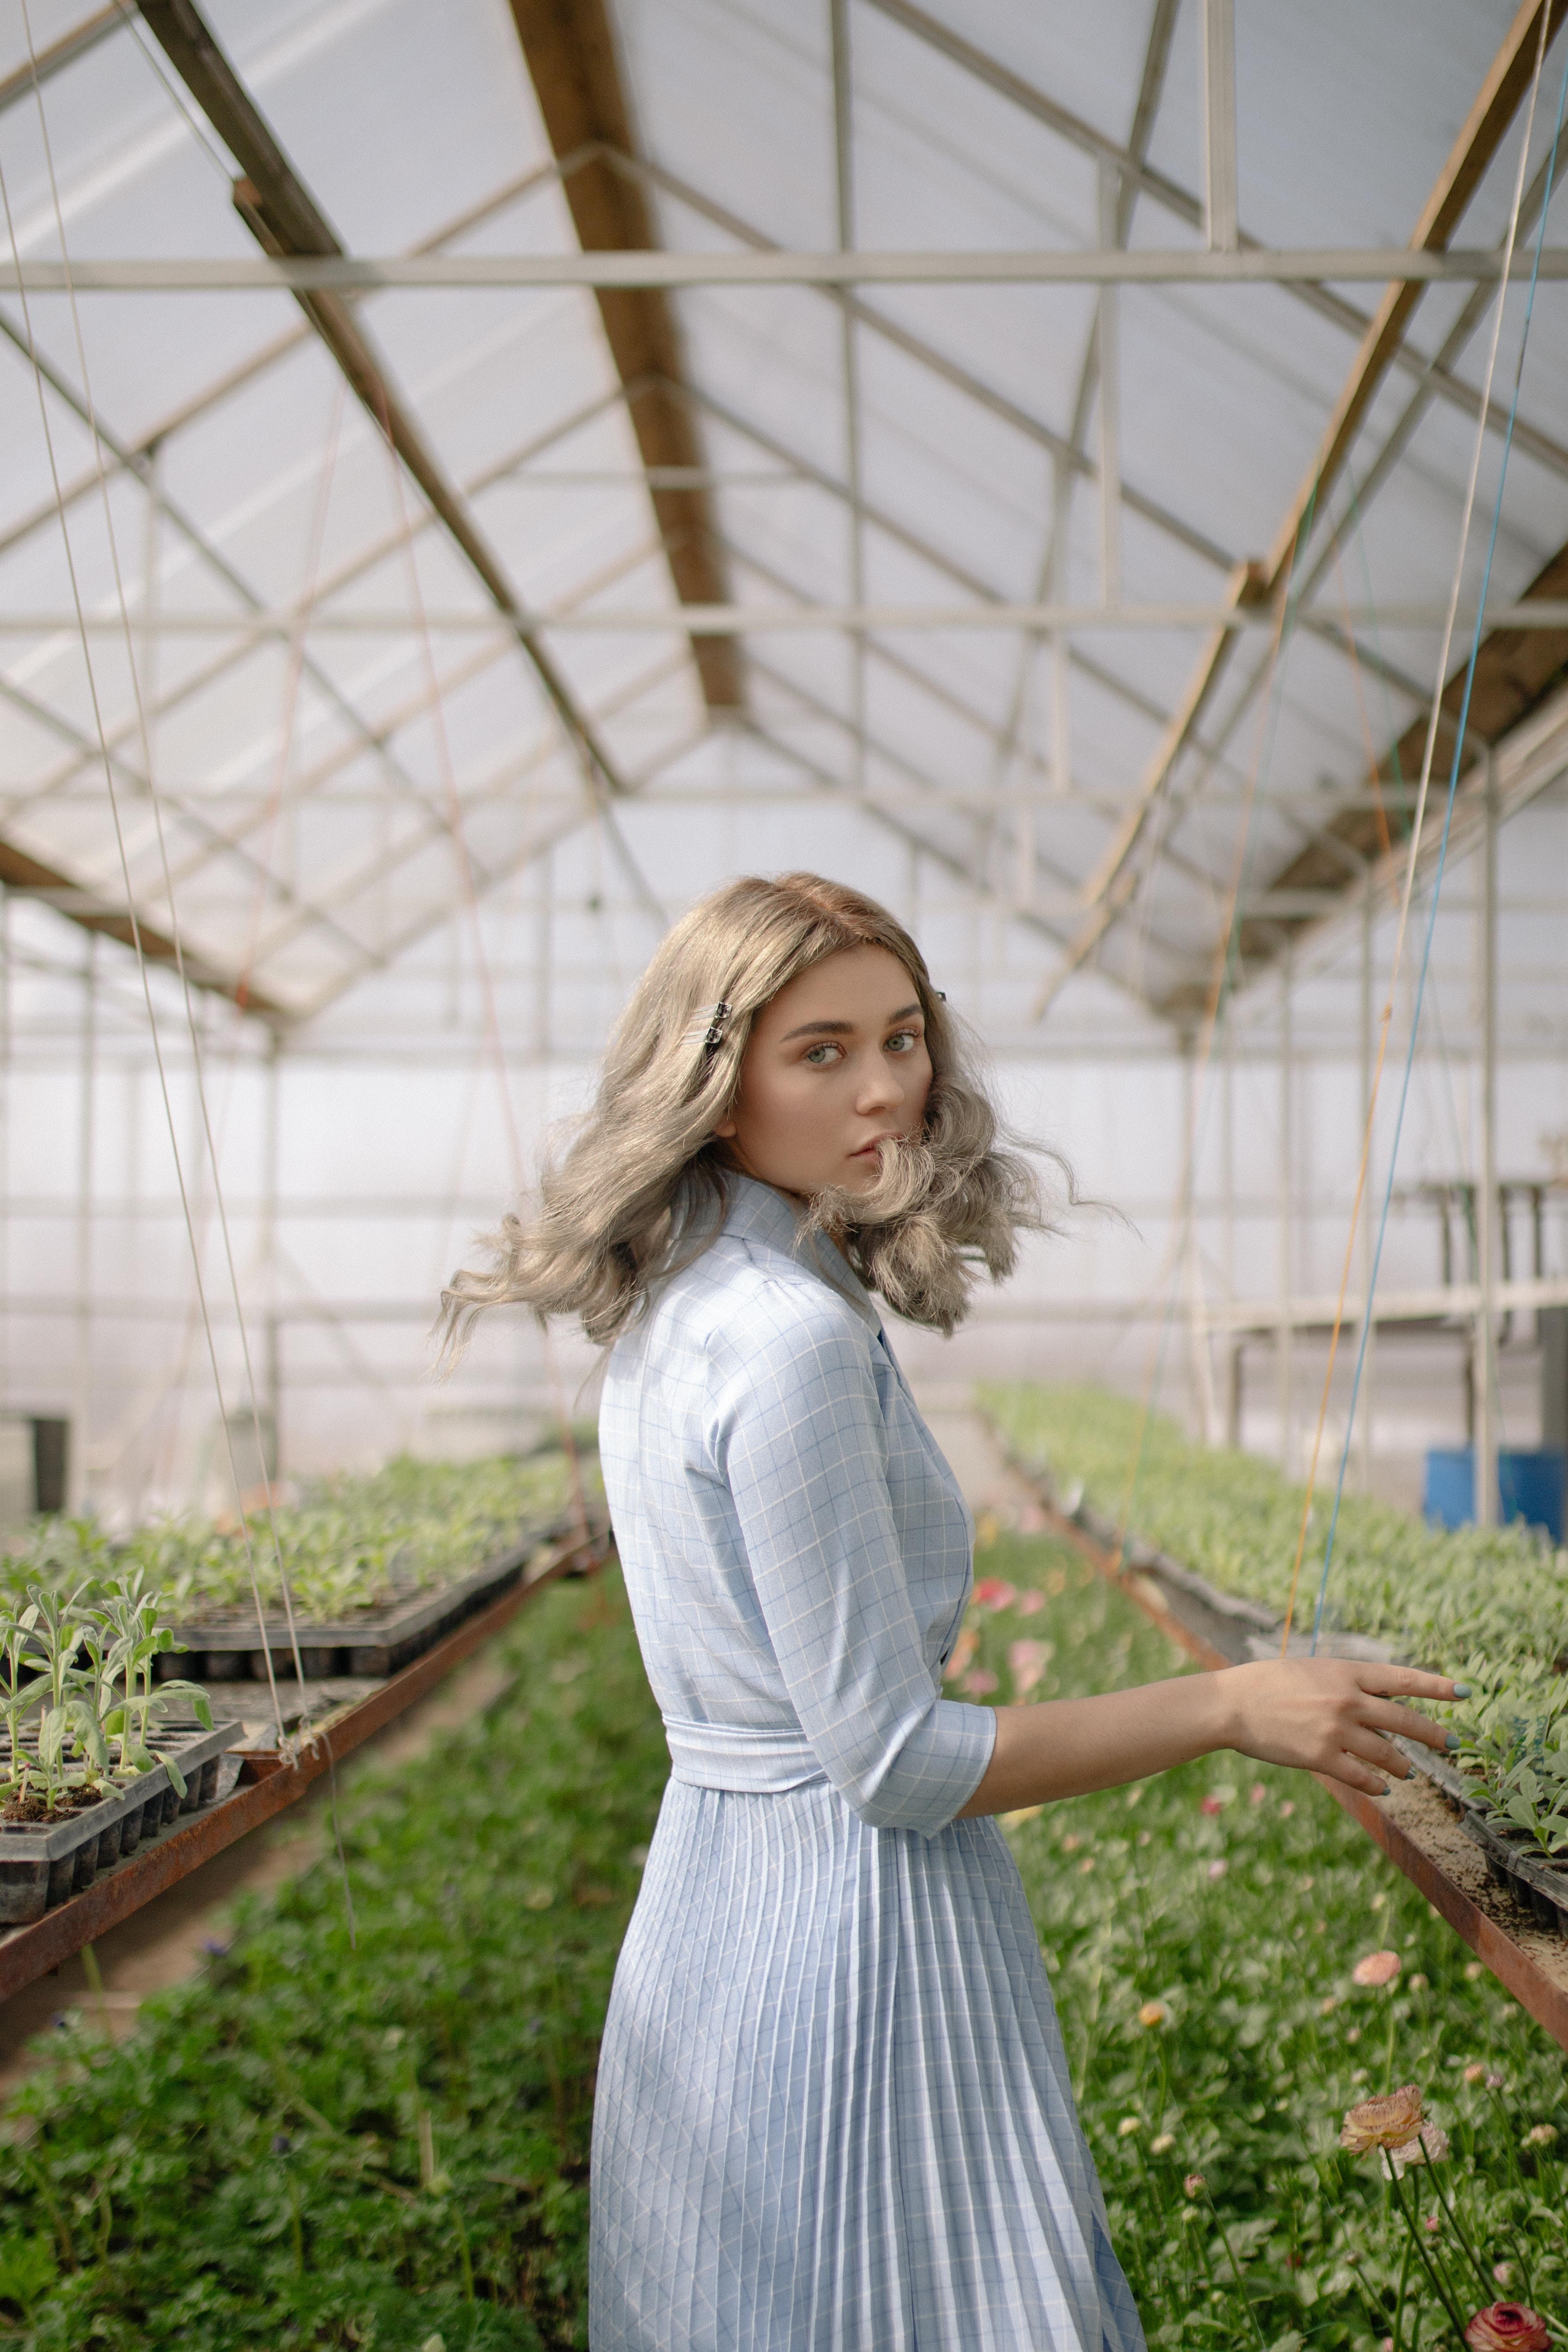 My instagram - aiony Please tag/credit me if you use/post/edit my photo! Location: Almaty, Kazakhstan / Daisy flowers Model: Veronika Zhangalova Muah: Robert Aldiyarov